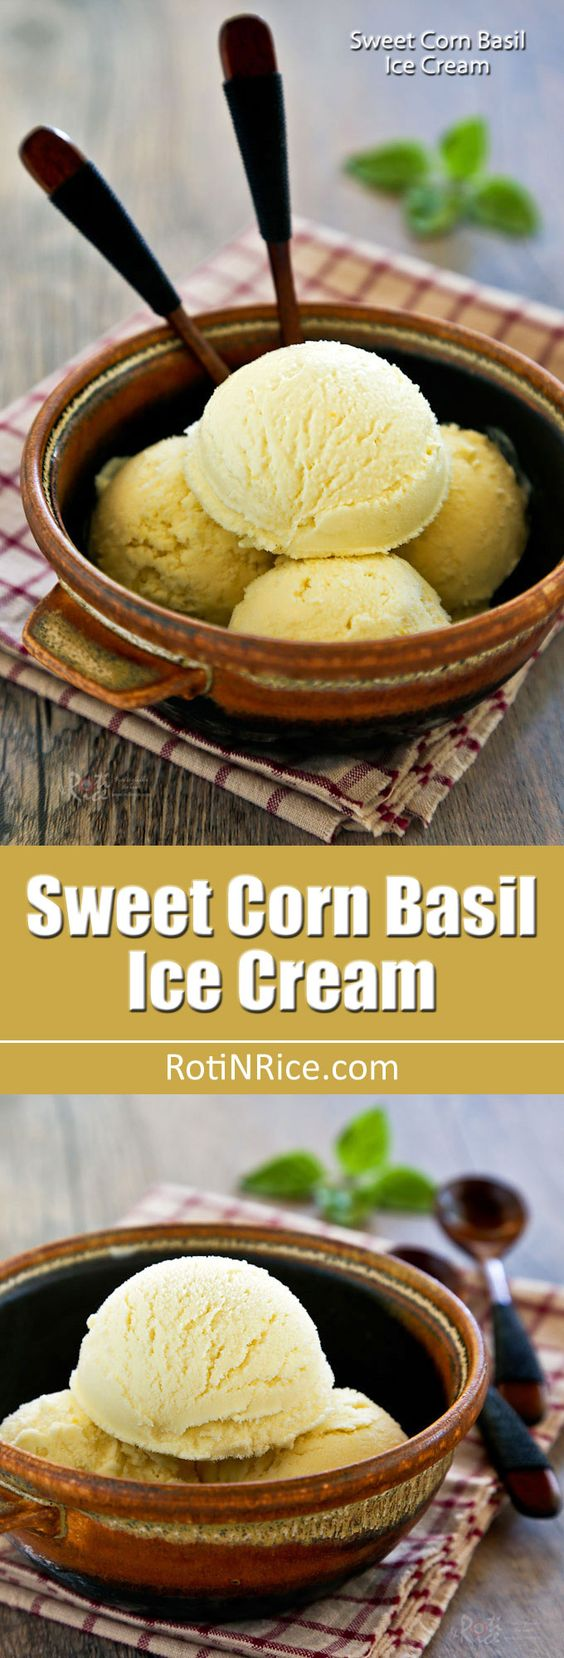 ... sweet corn sweet the o jays ice spicy basil ice cream cream basil